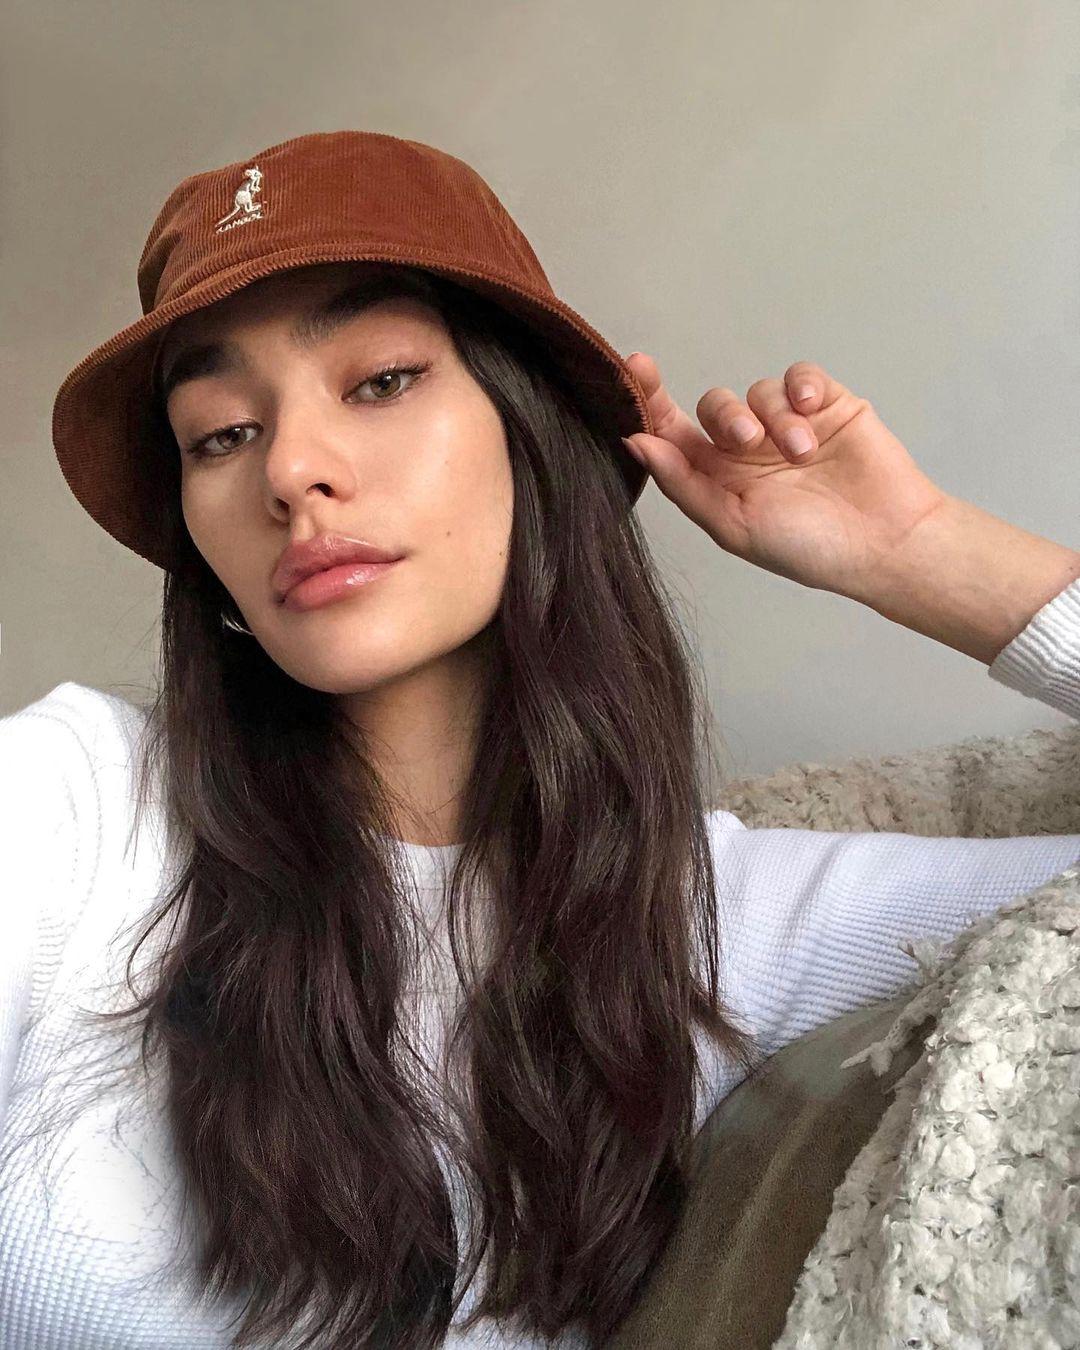 Kaitlyn-Fitzpatrick-Wallpapers-Insta-Fit-Bio-19